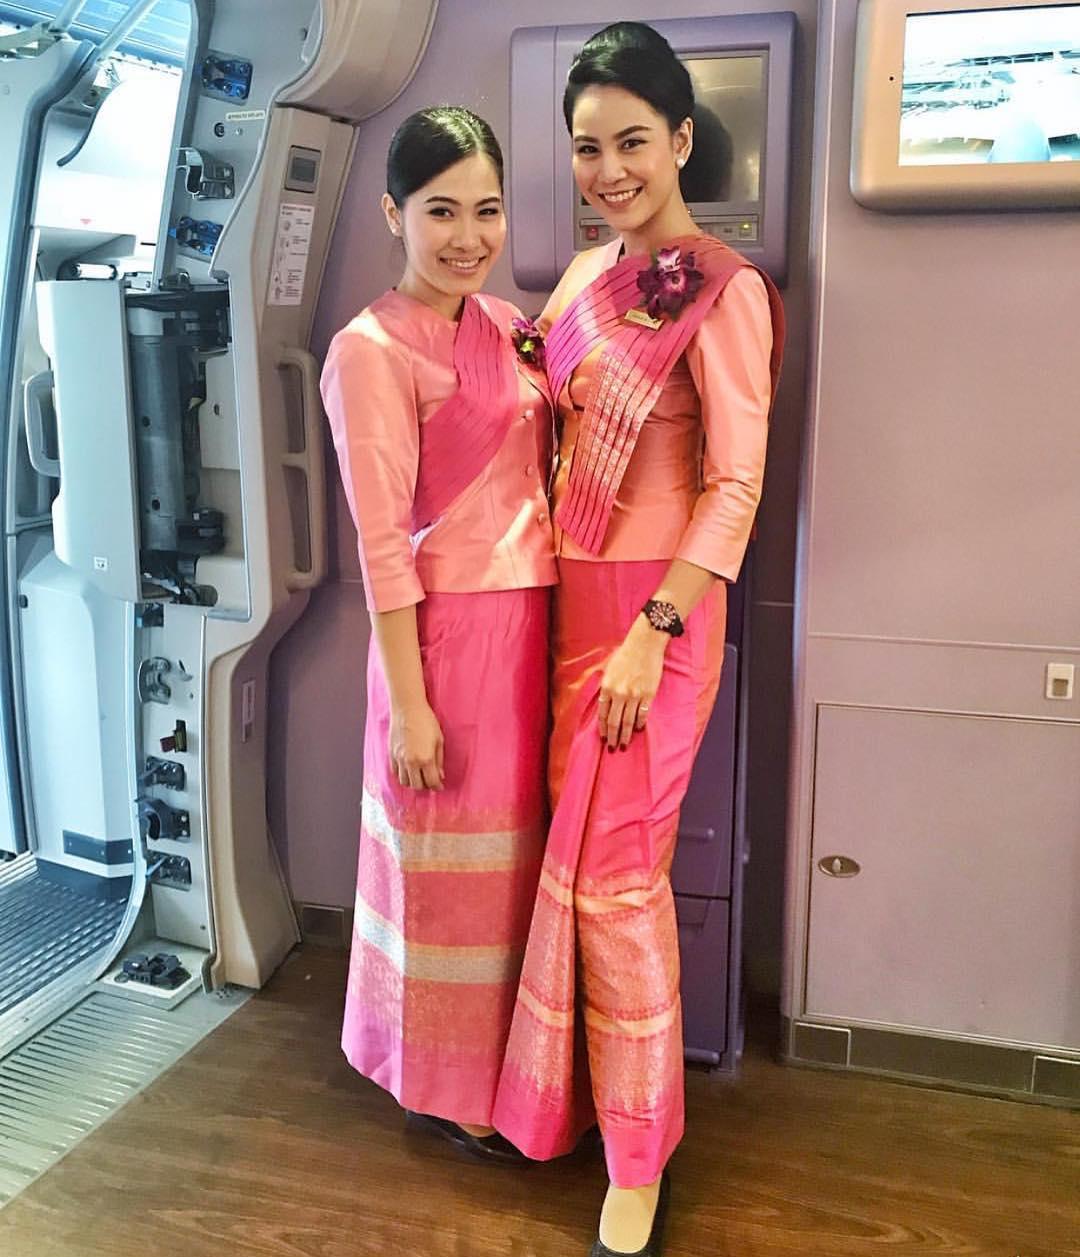 Thai Airways flight attendants in traditional thai dresses